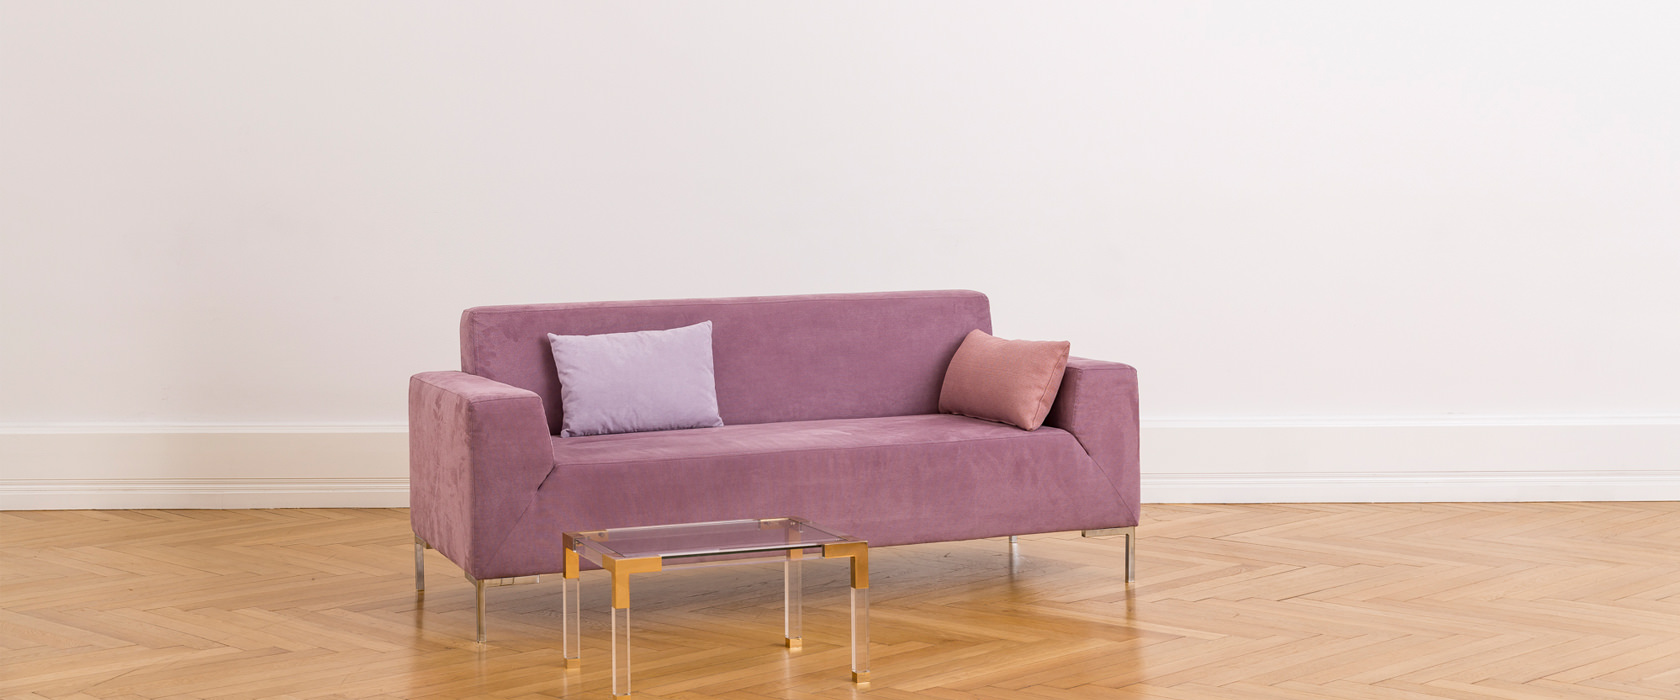 Тримісний диван Livorno Classic - Фото 2 - Pufetto